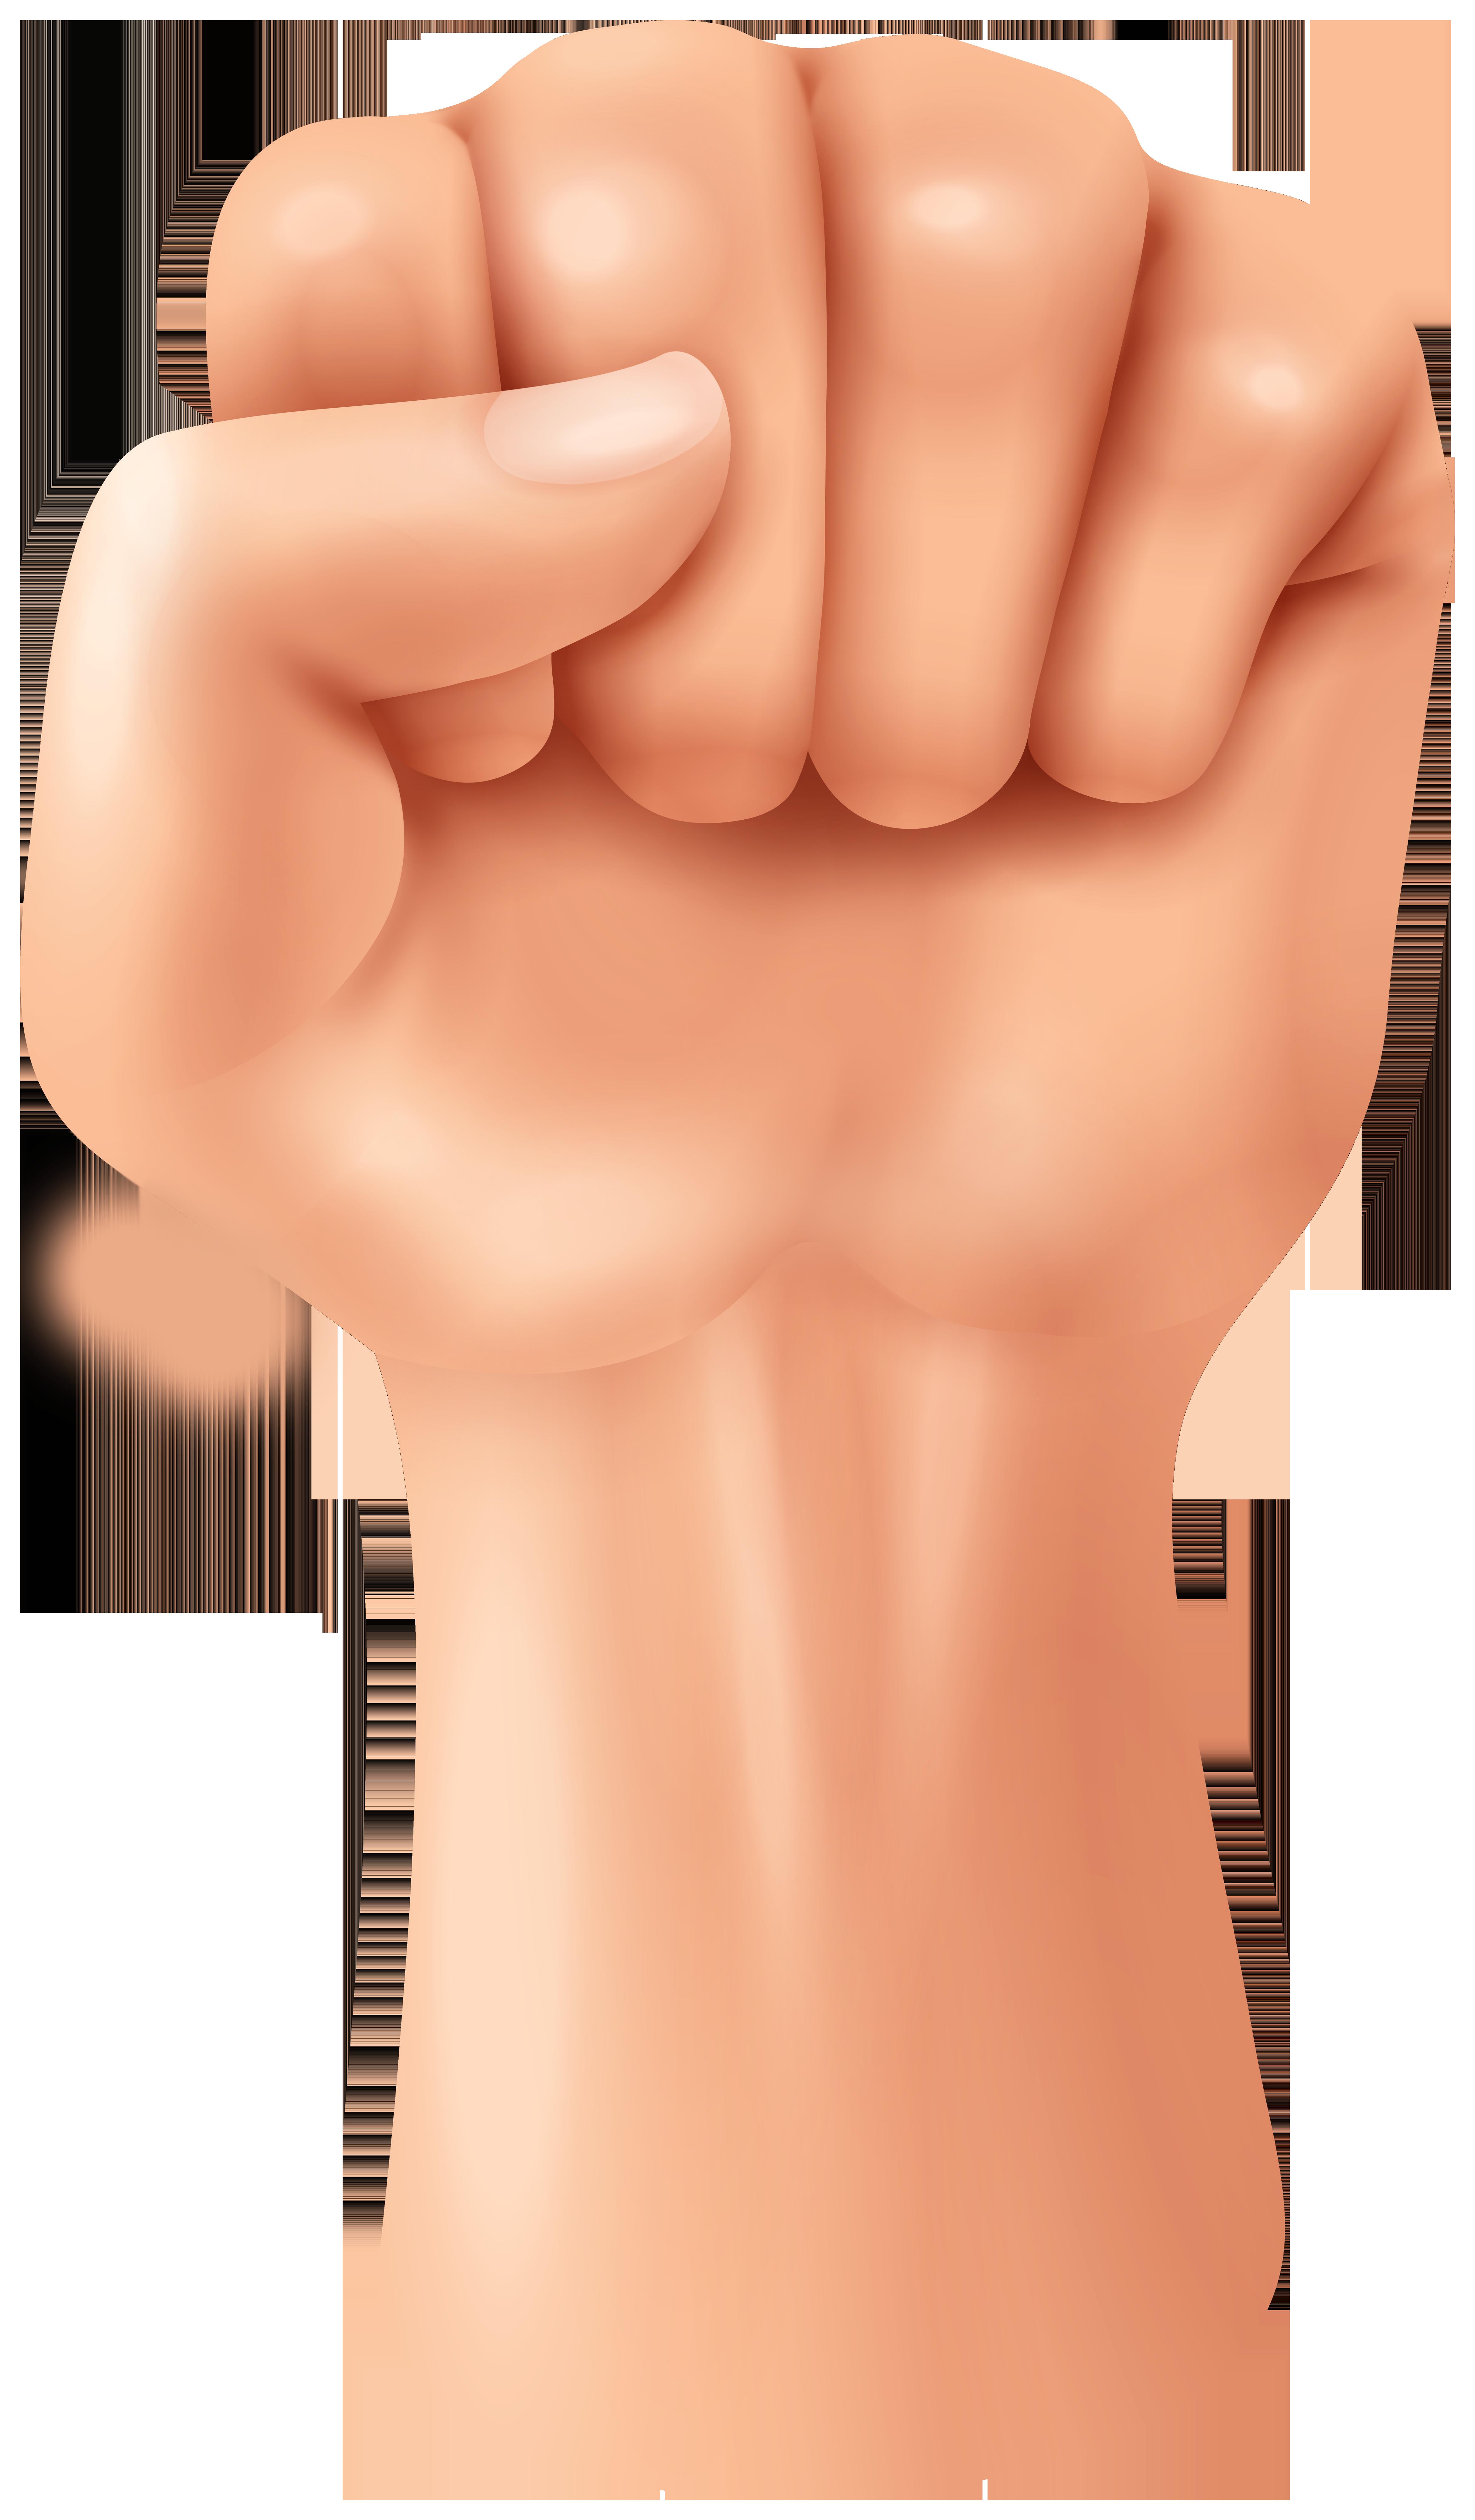 Hand Fist Png In 2020 Hand Fist Fist Png Pack fists sharingan/пак фистов шаринган. pinterest